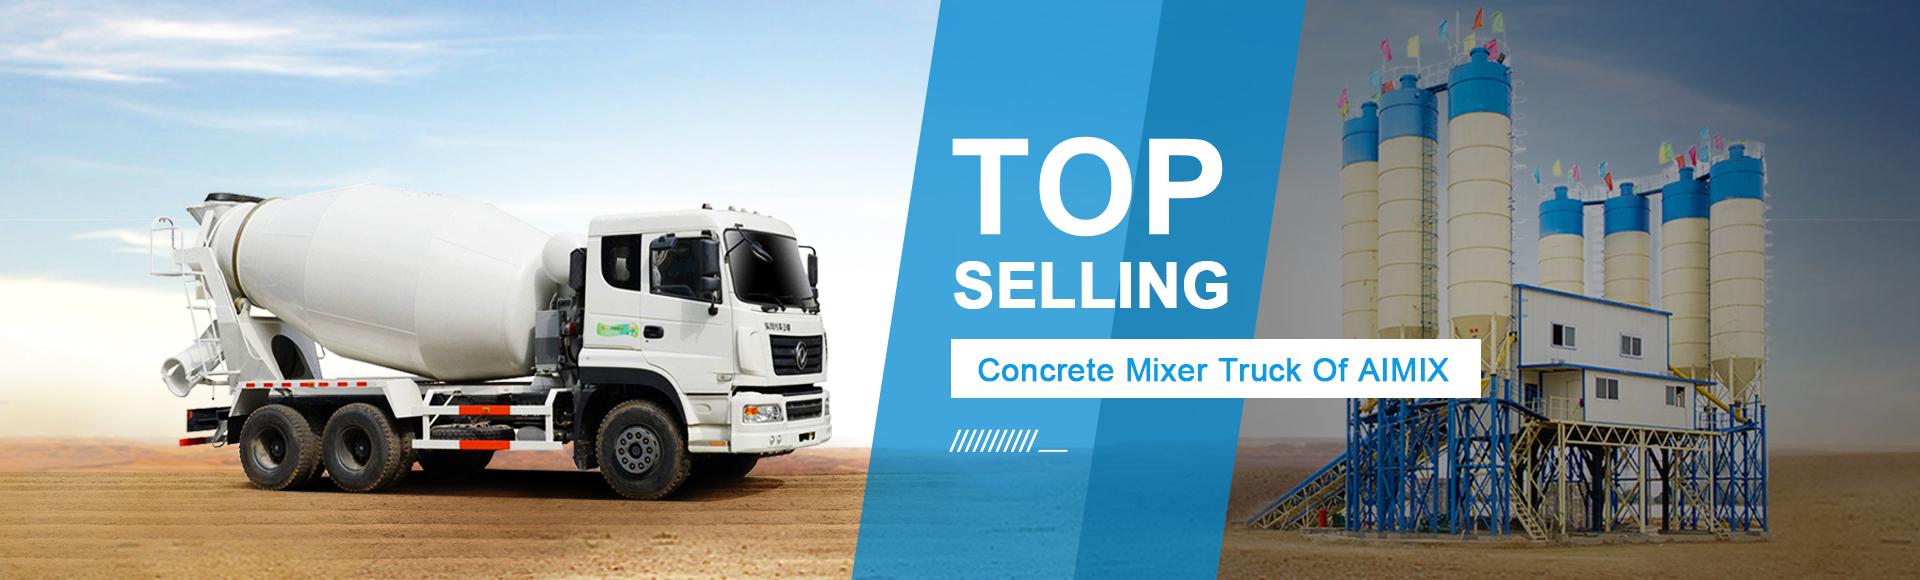 concrete mixer truck banner